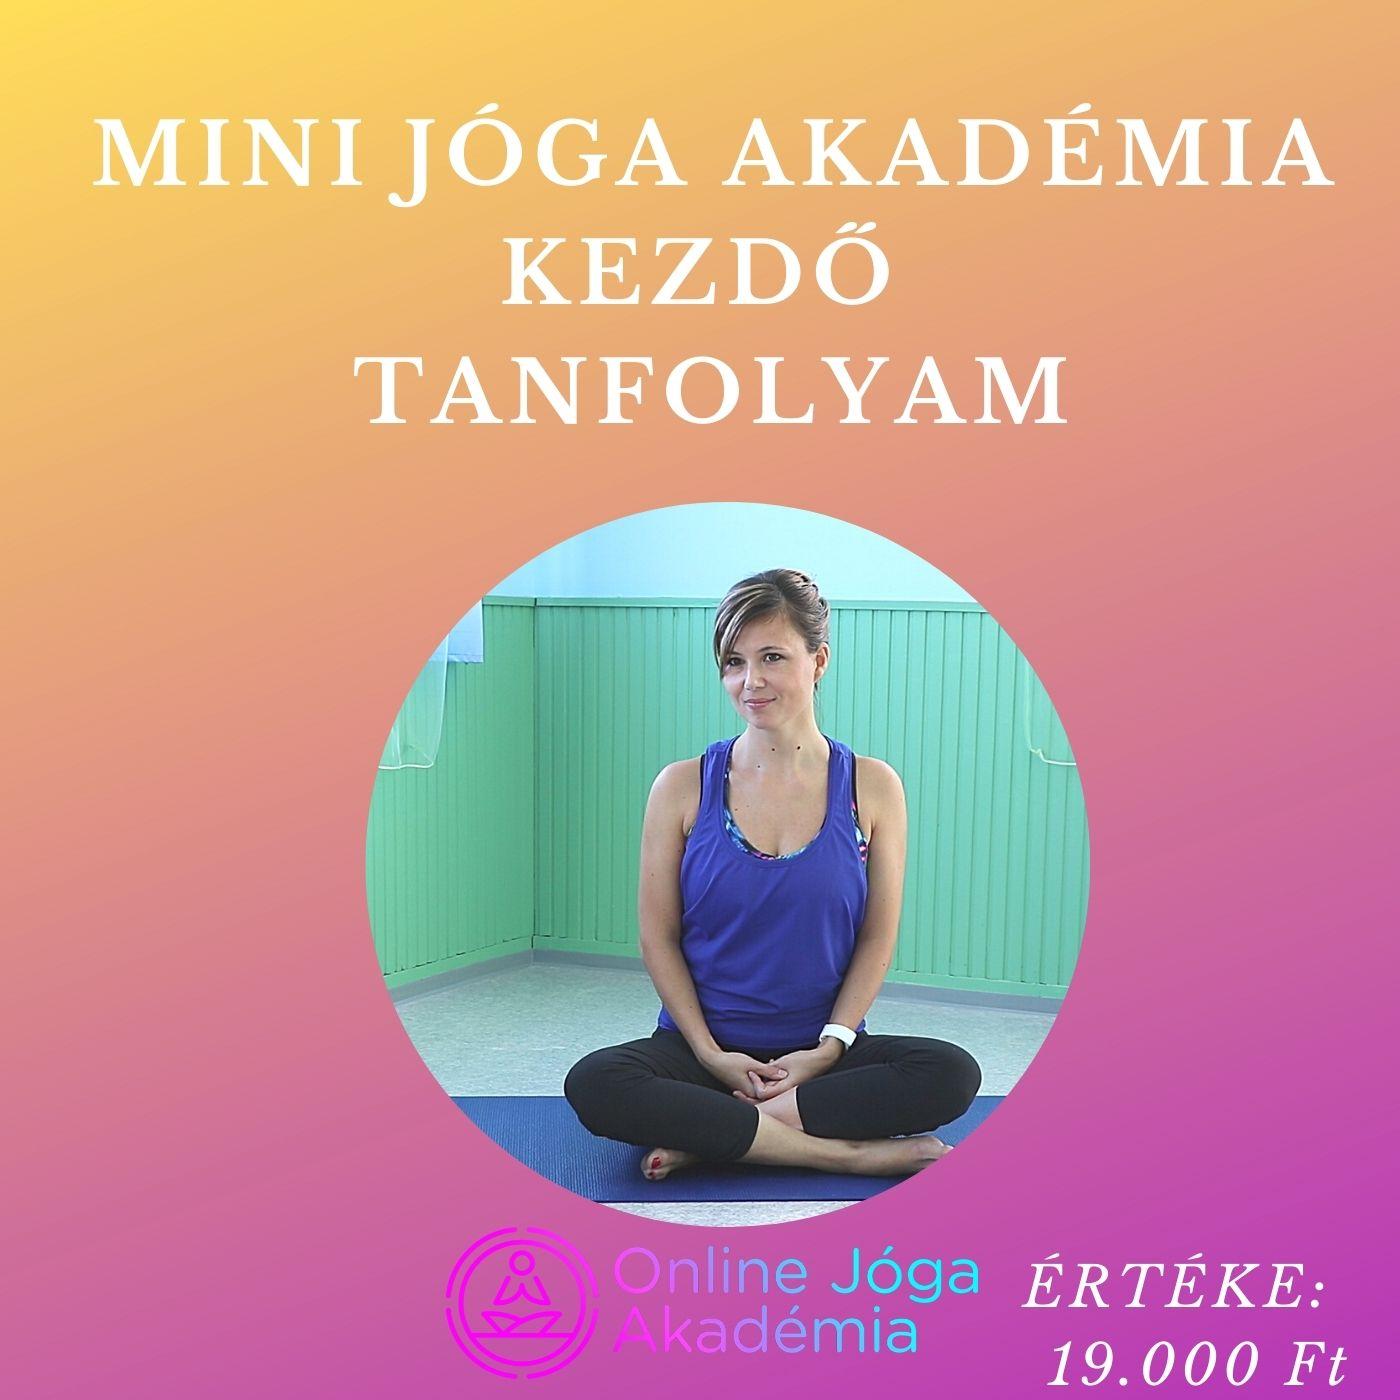 Mini Jóga Akadémia online jóga